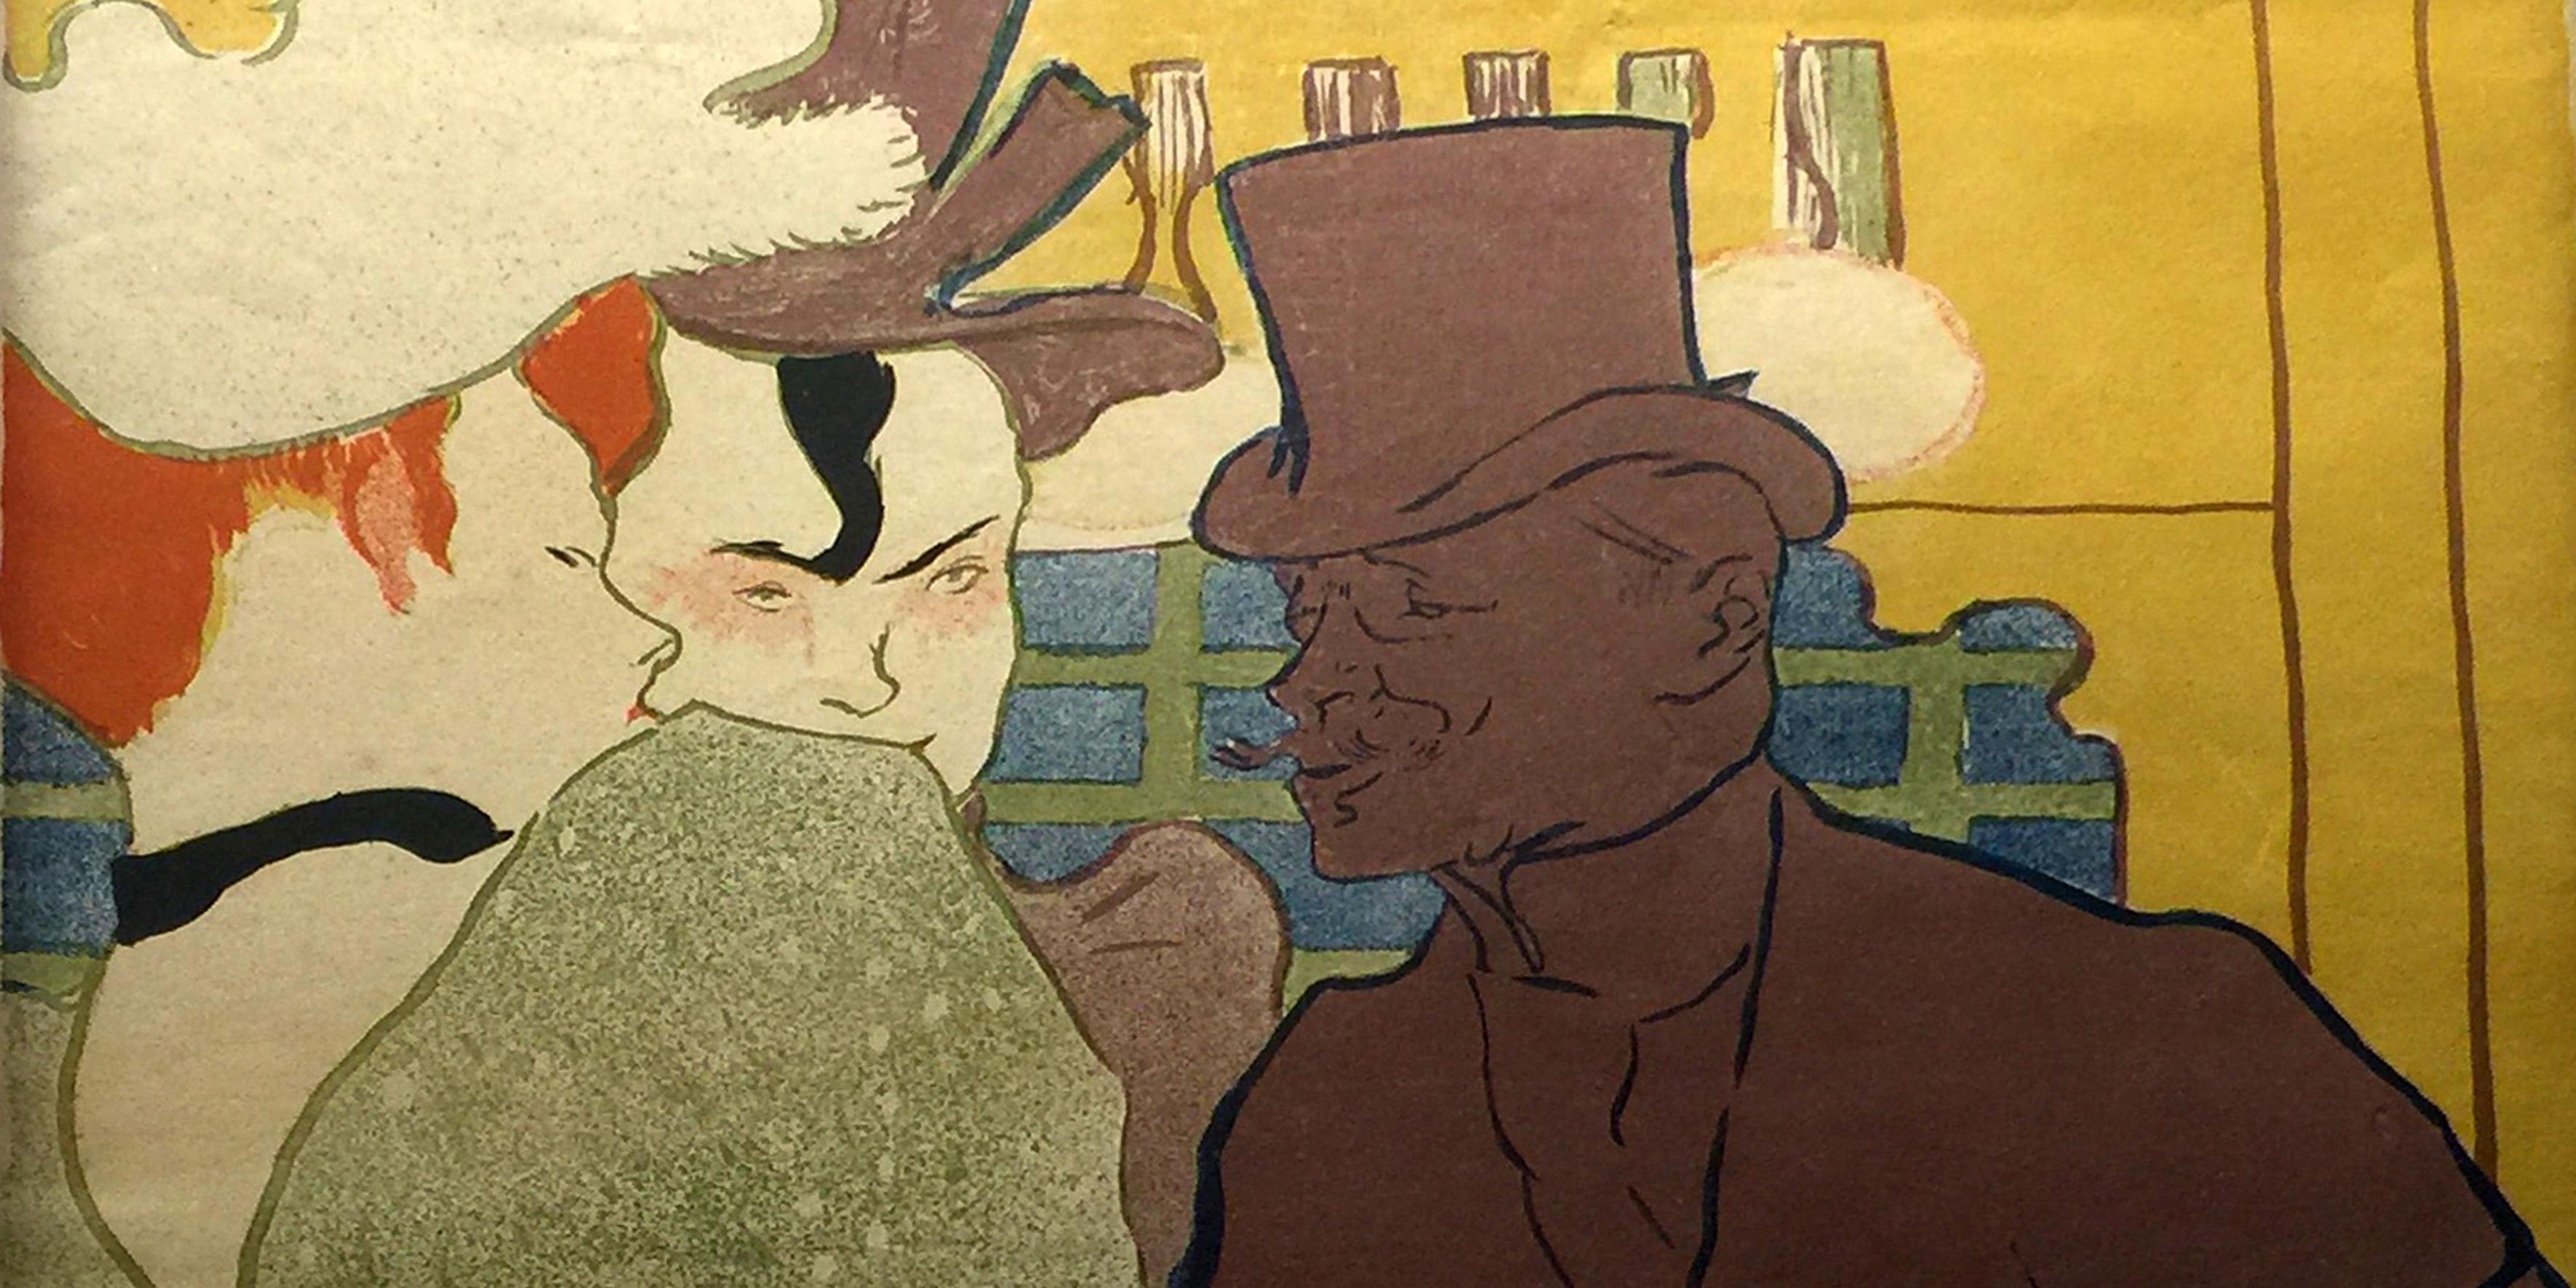 L'inglese al Moulin Rouge-Litografia a colori-1892-Toulouse Lautrec